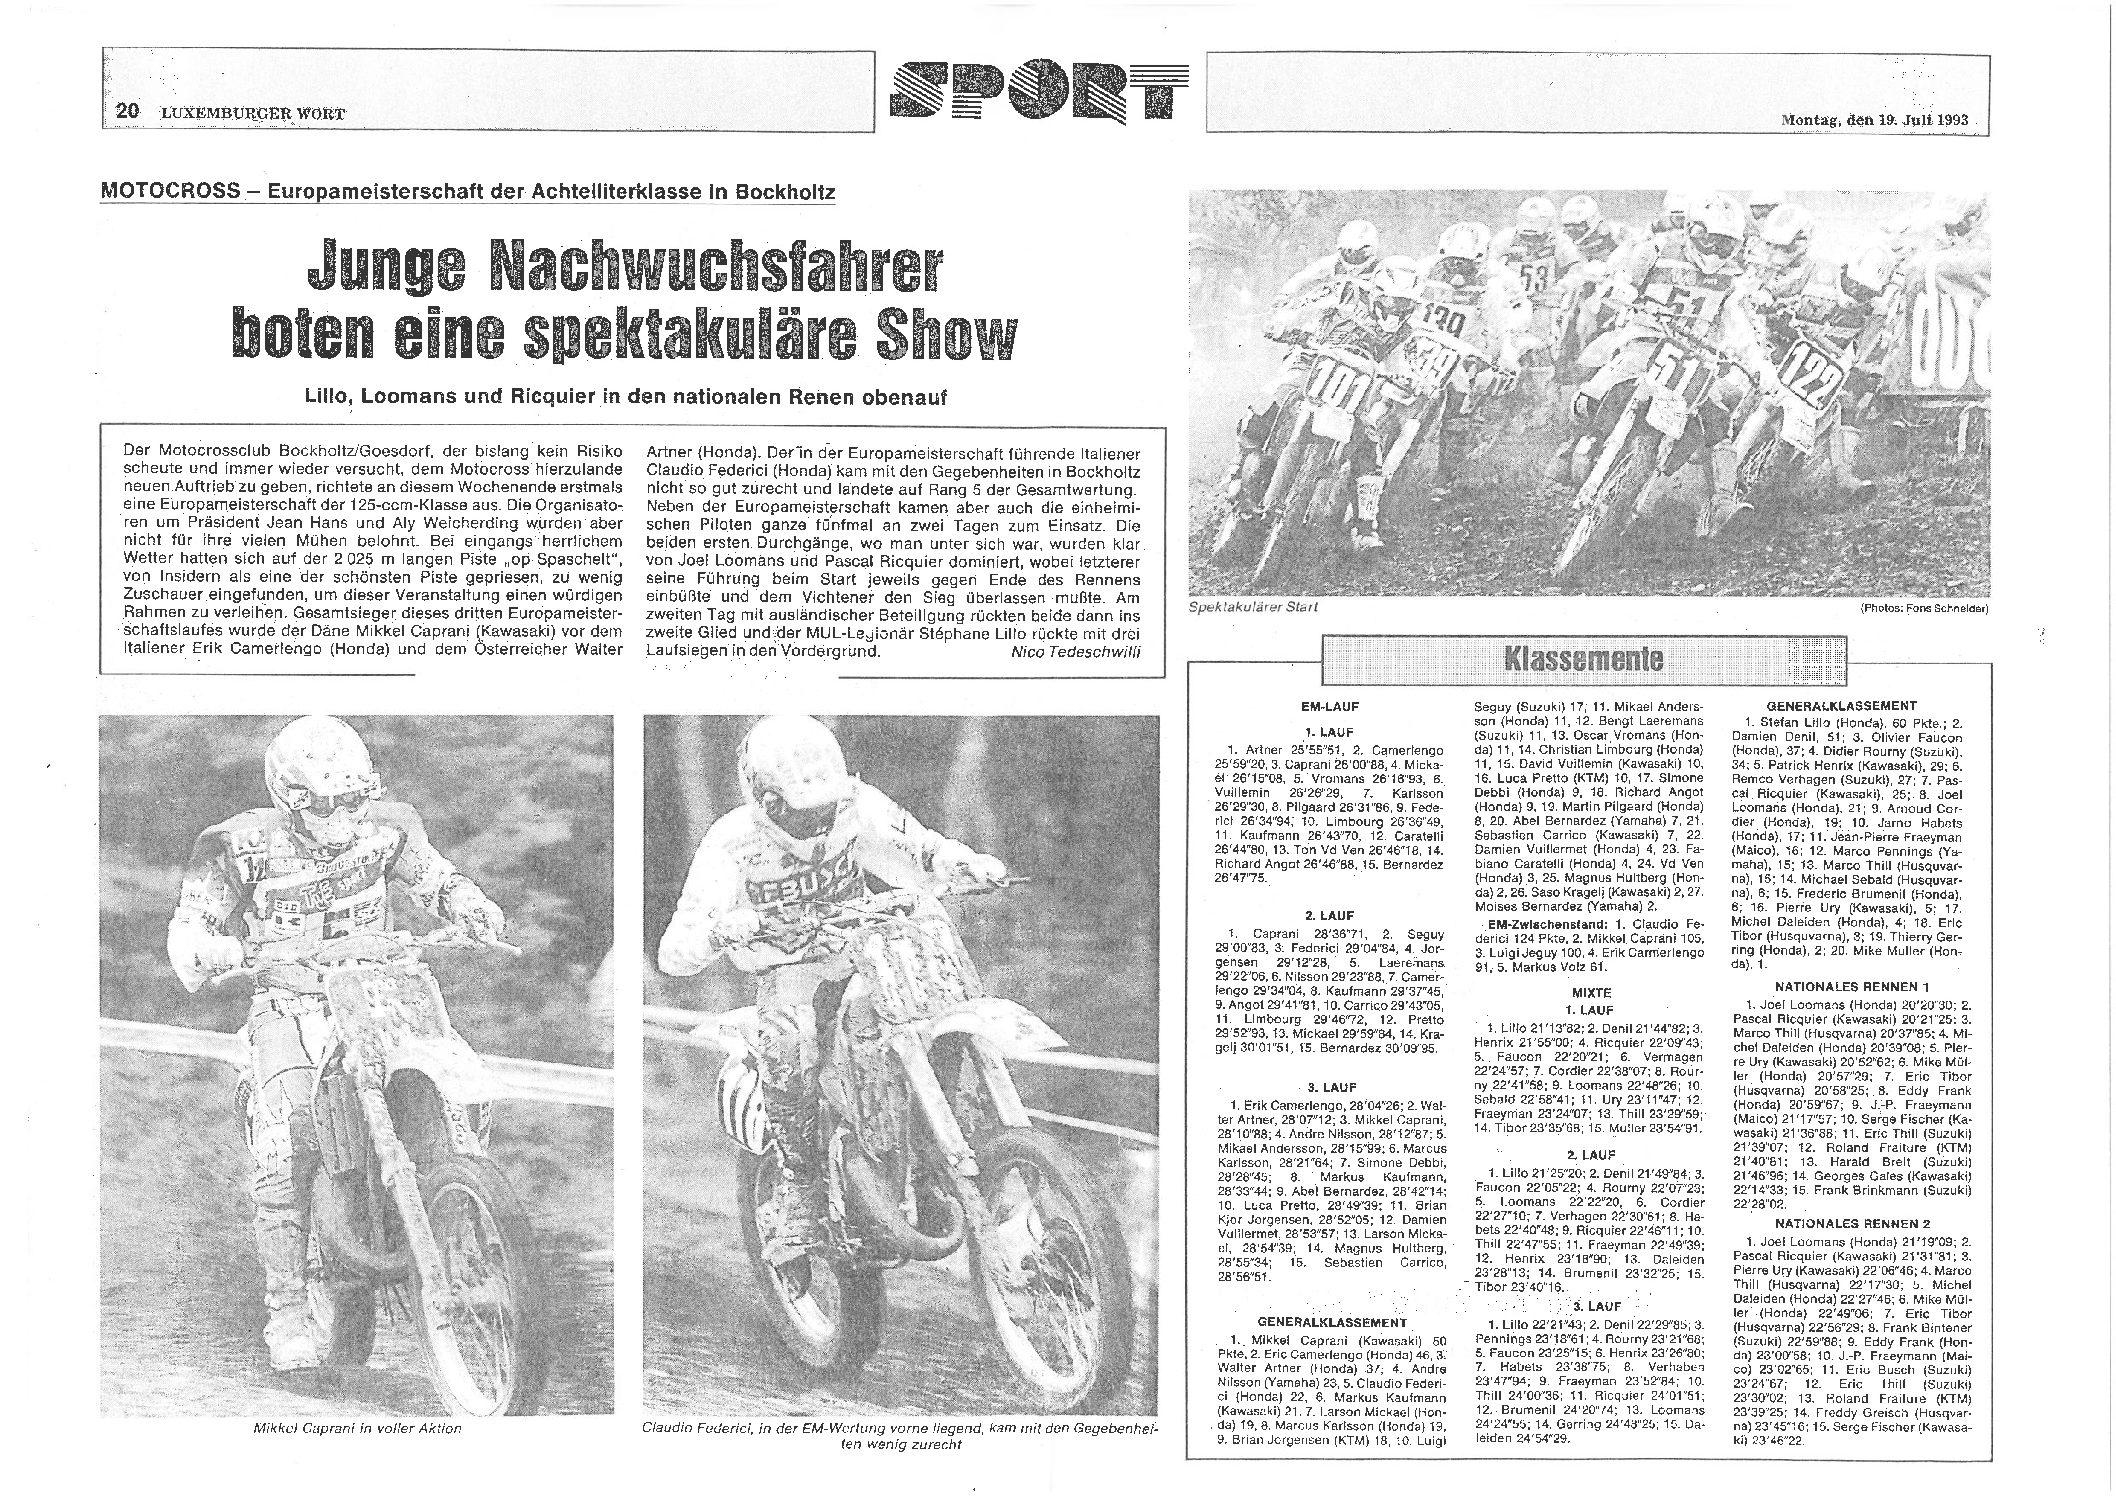 Article LW 19.07.1993 - Nico Tedeschwilli